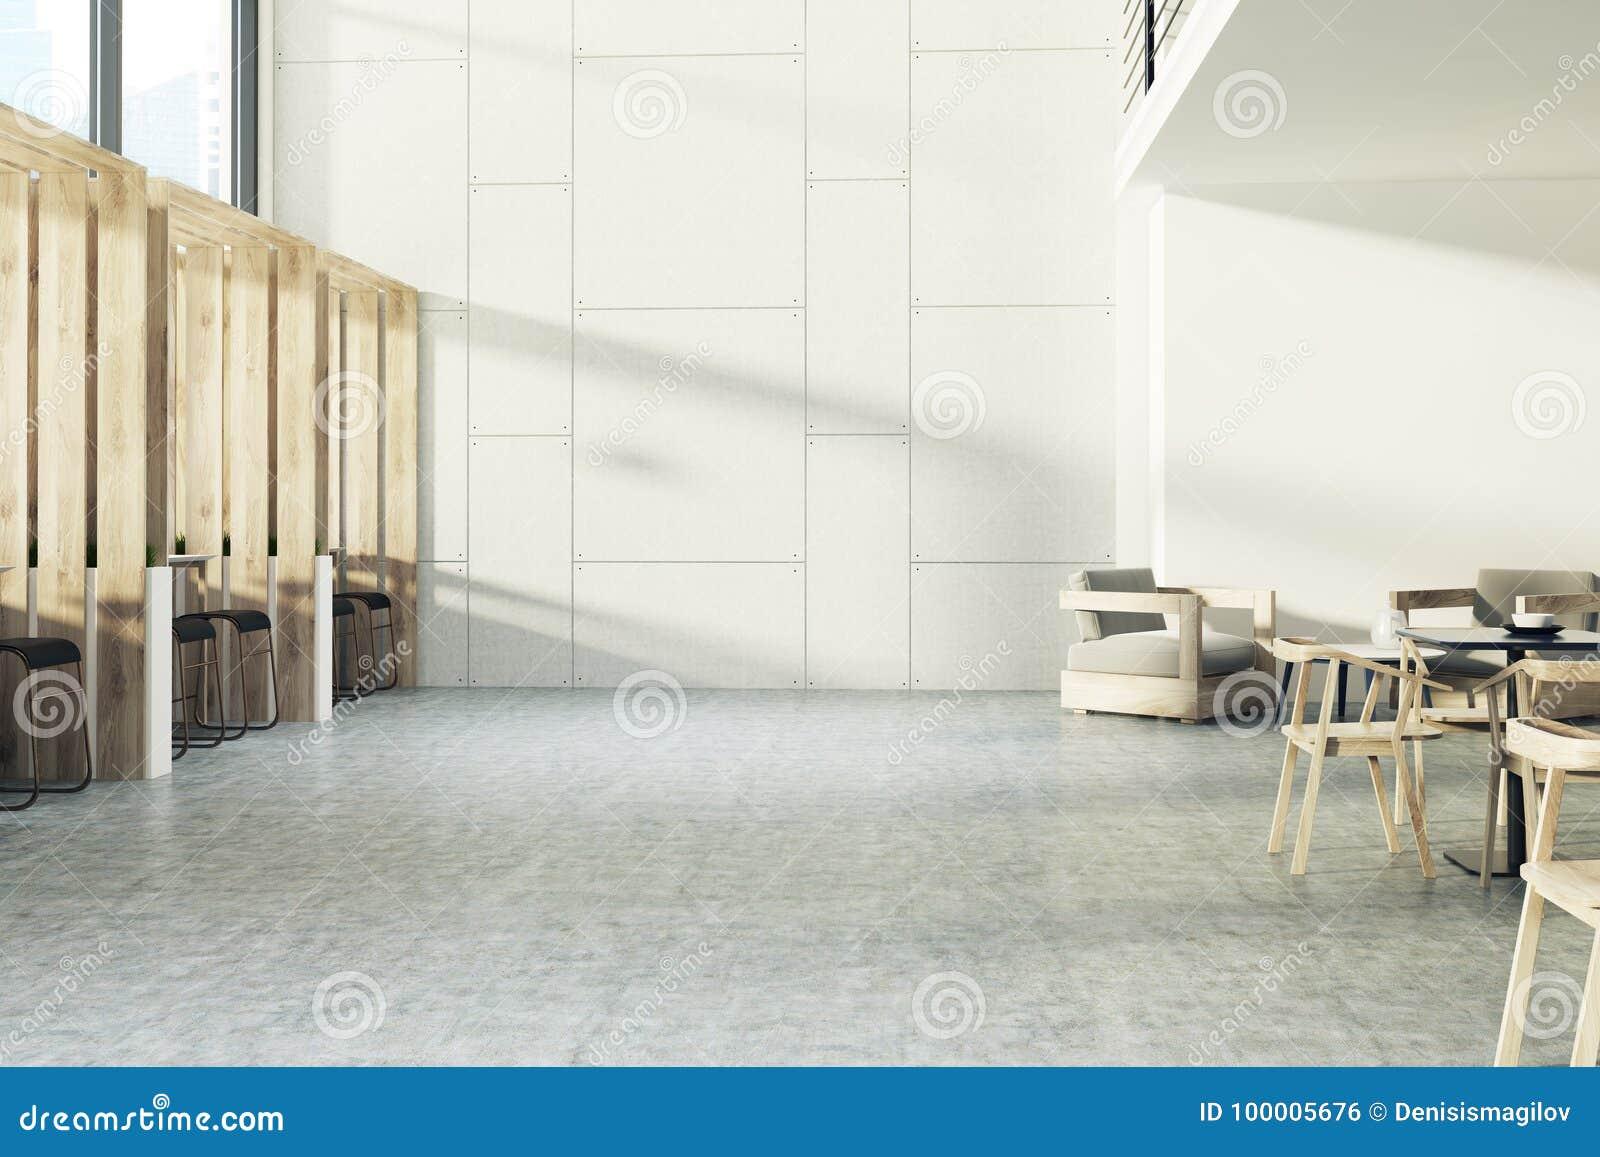 Modern interior design of the corridor stock image image of